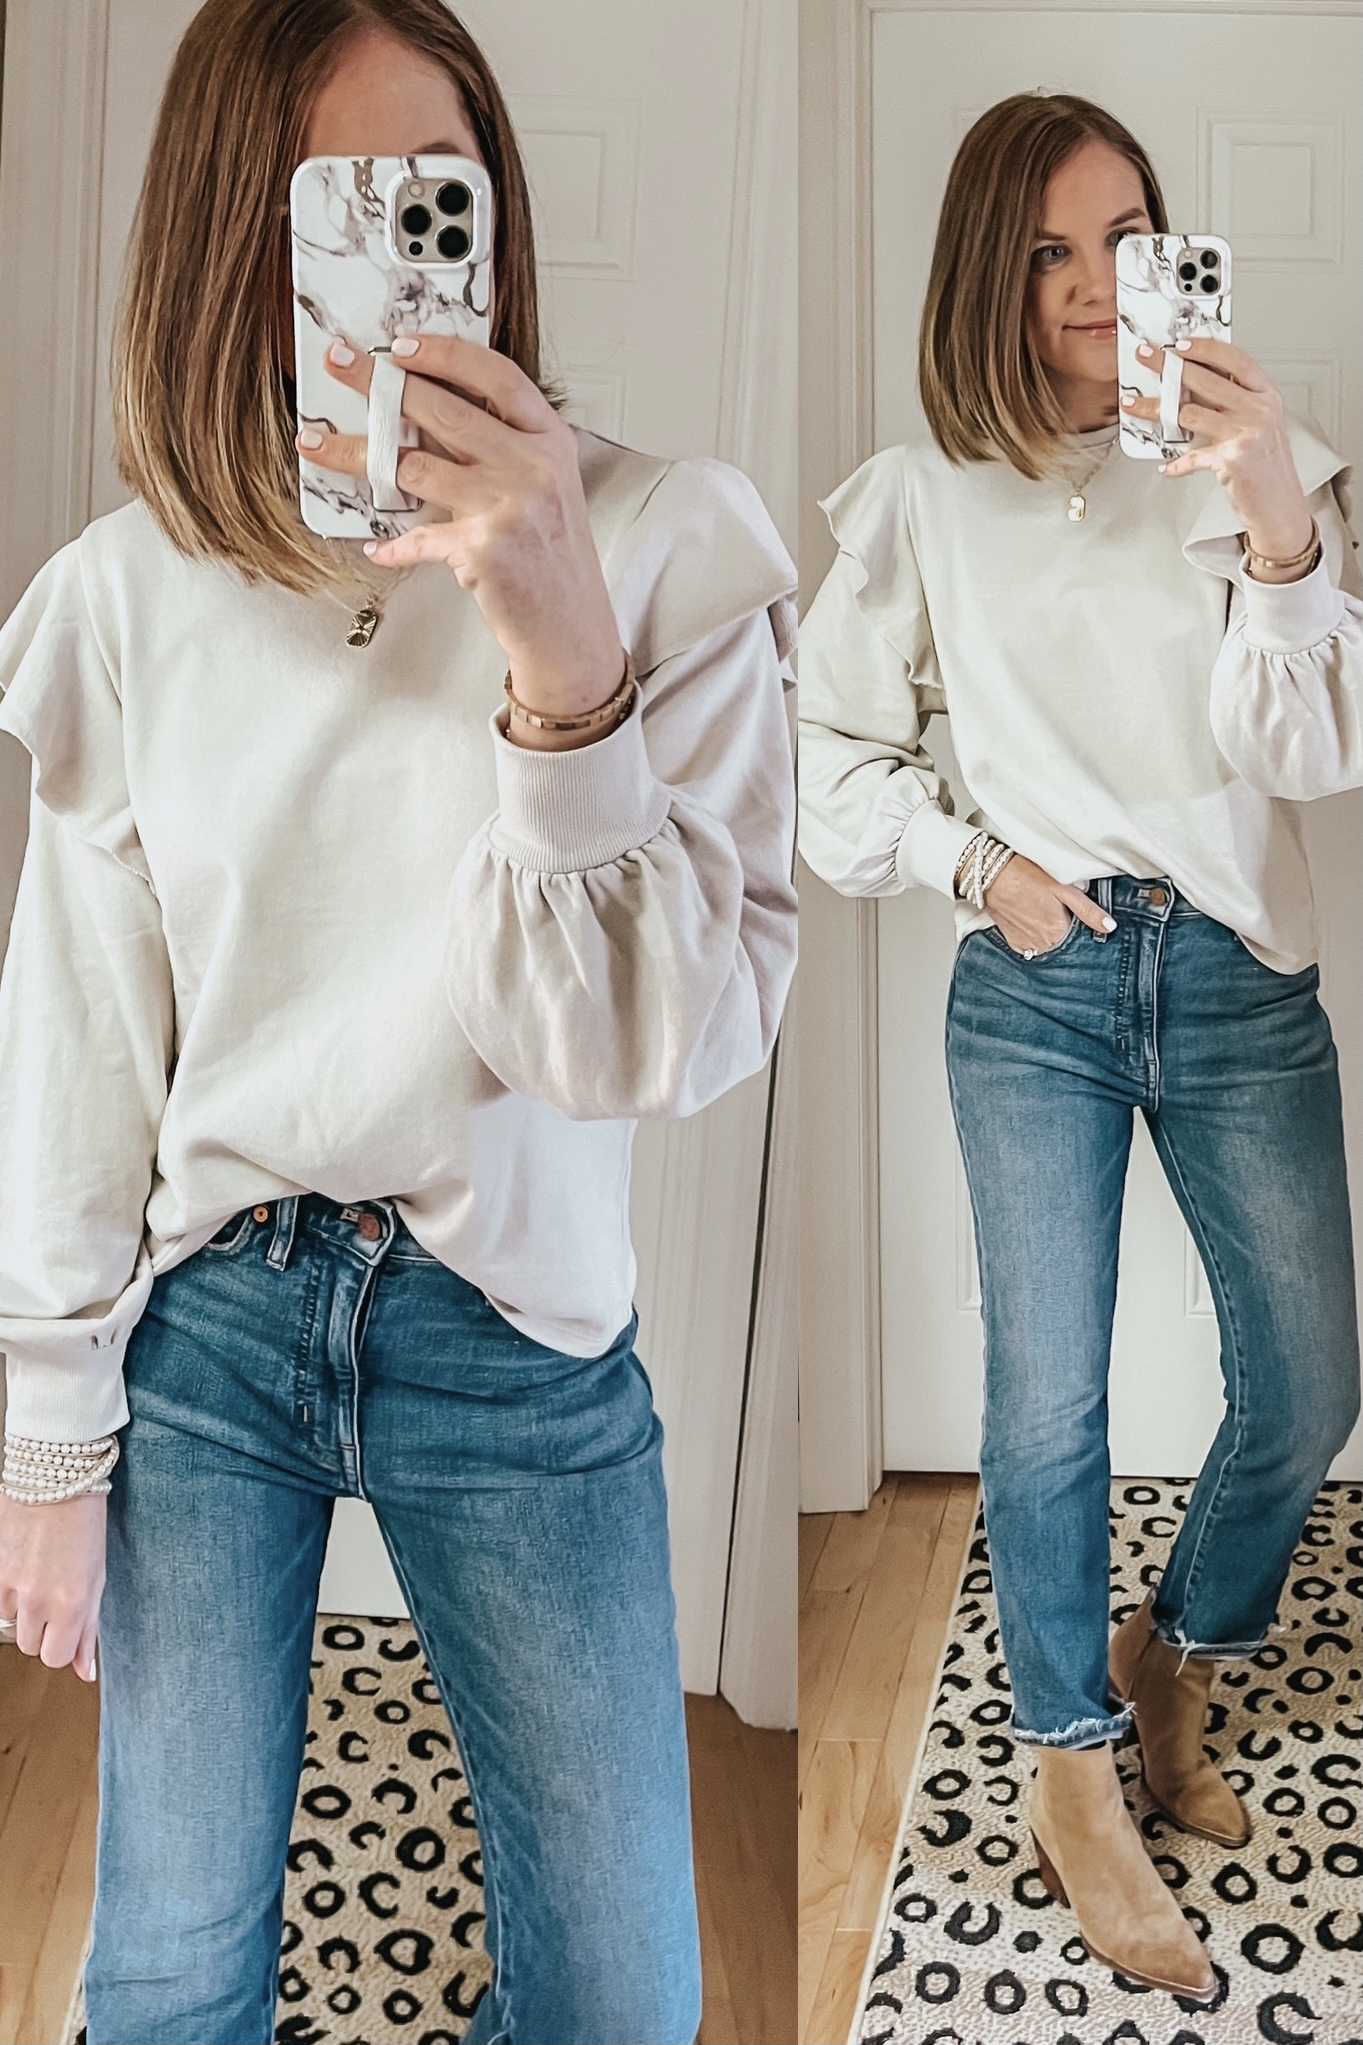 Target Outfits You Need This Winter, off white ruffle sweatshirt, Universal Thread ruffle sweatshirt